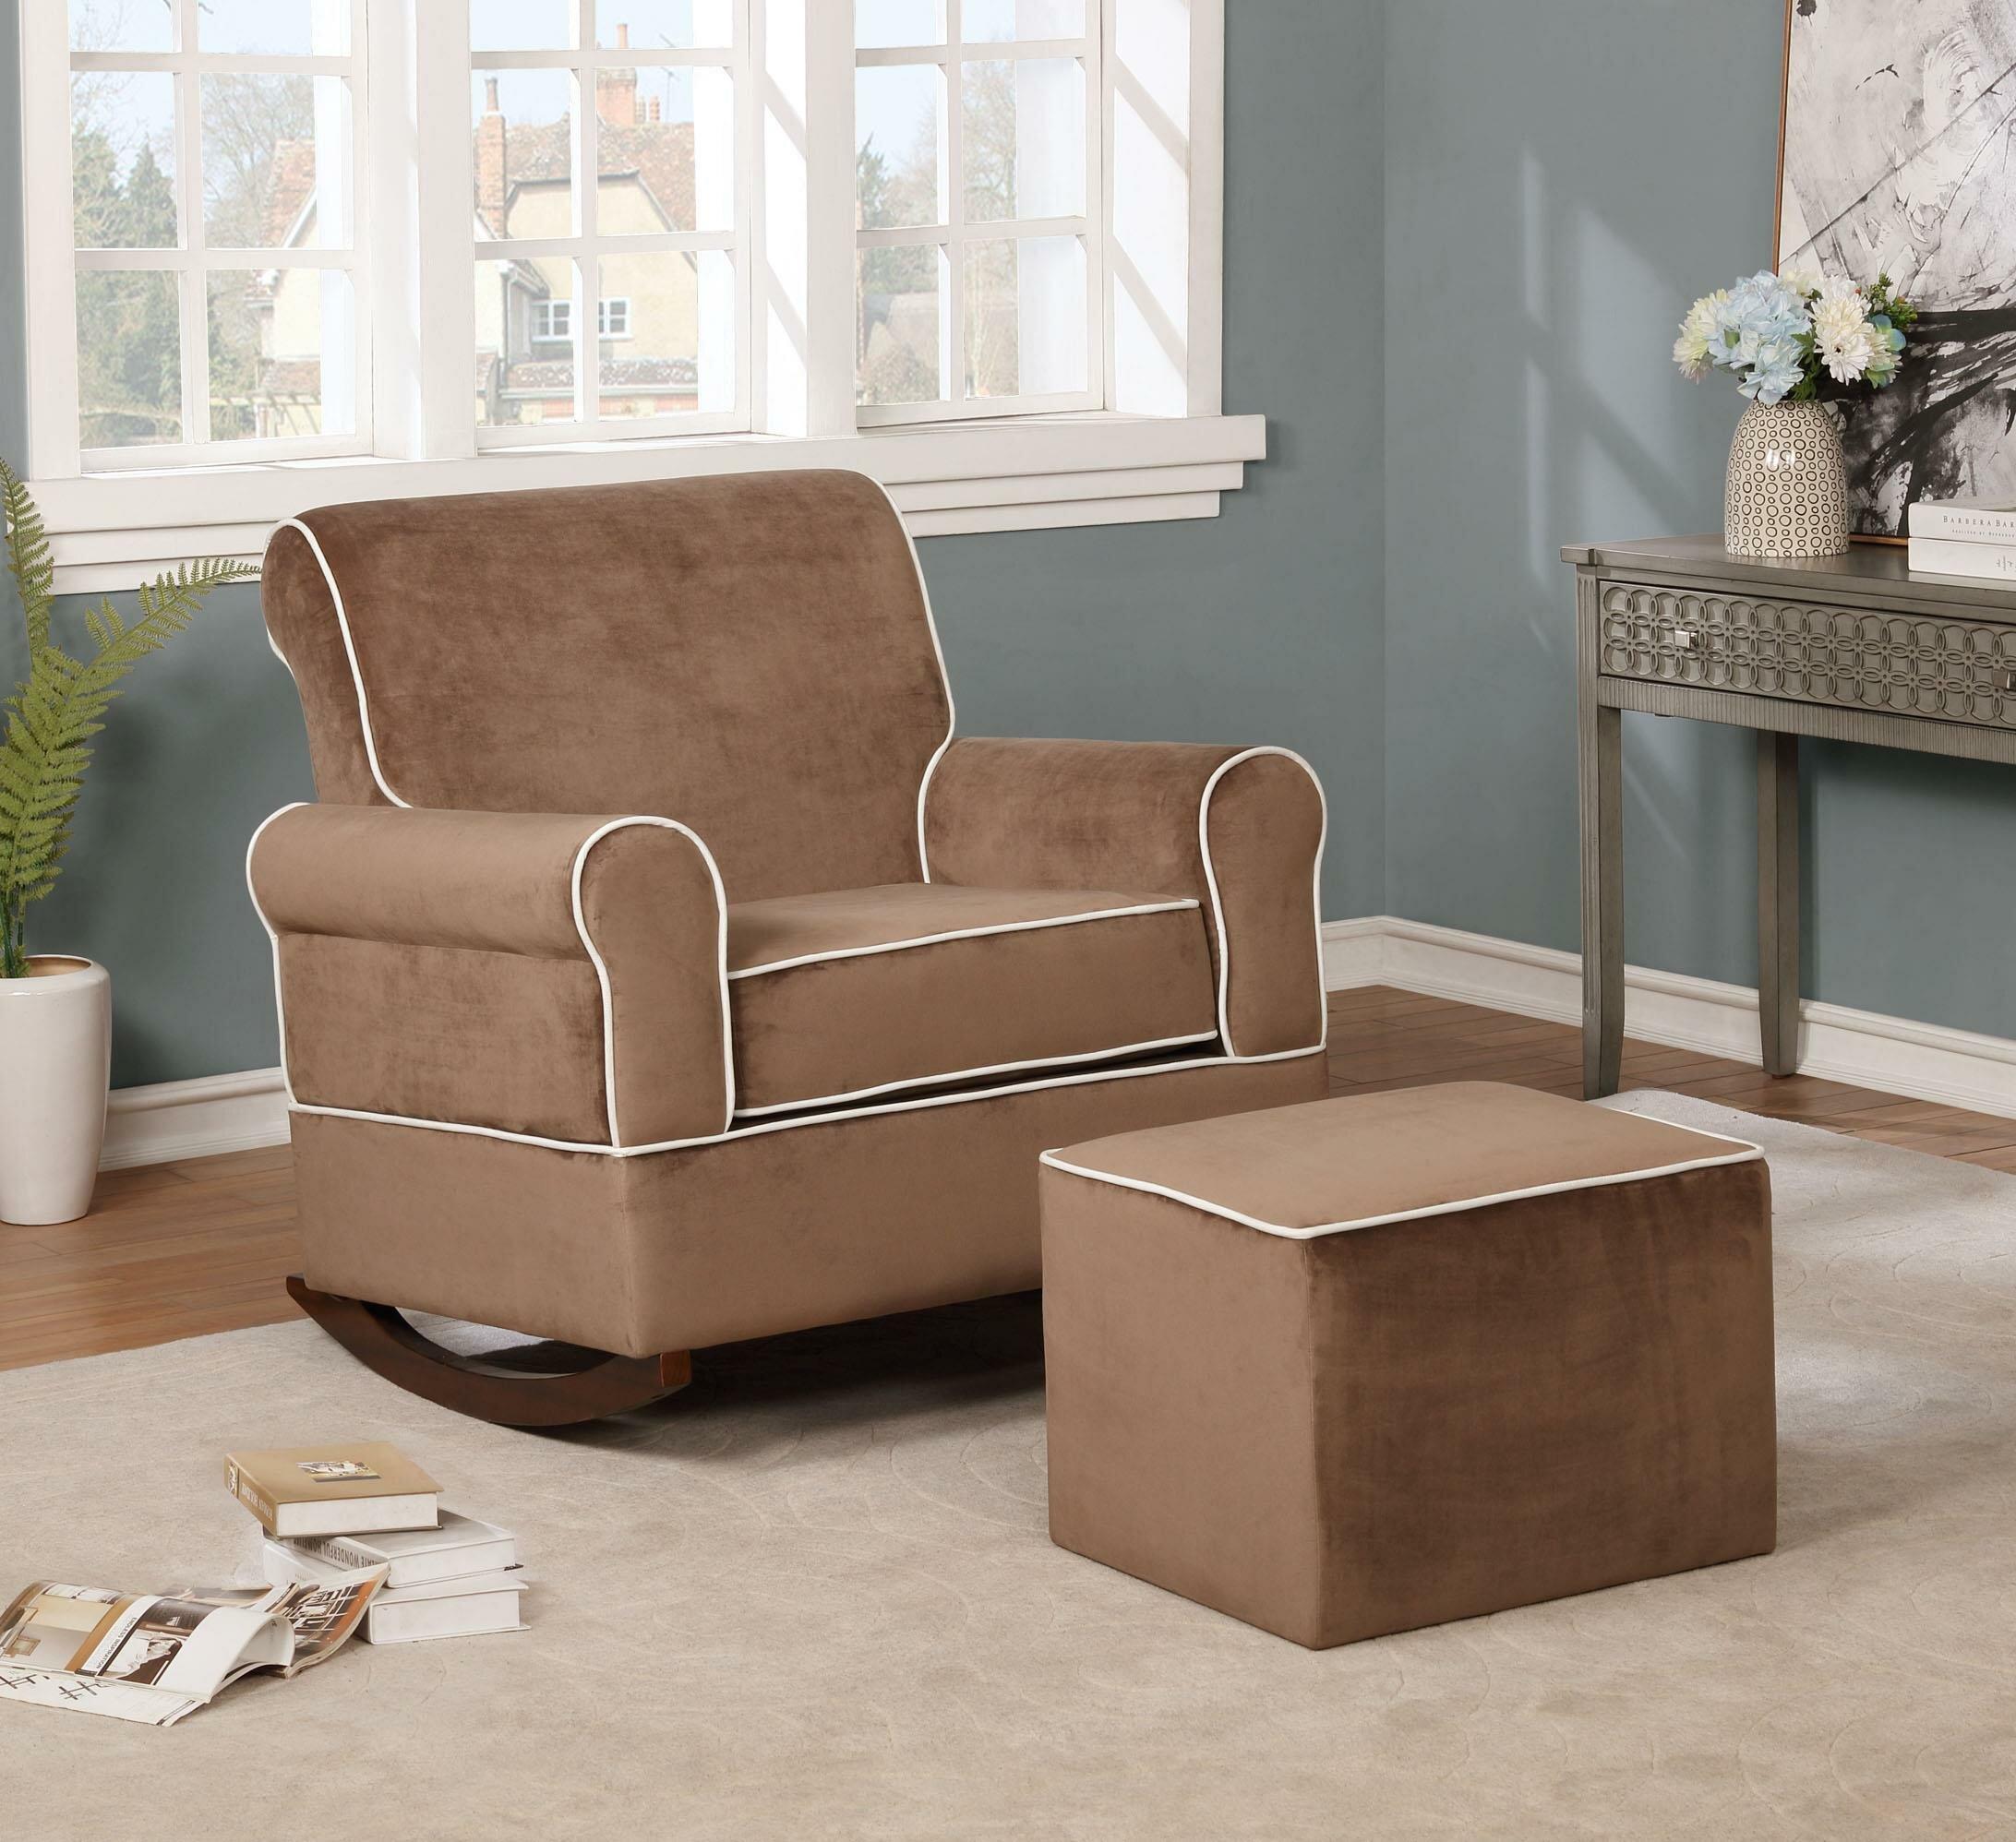 Swell Chappell Rocking Chair And Ottoman Creativecarmelina Interior Chair Design Creativecarmelinacom